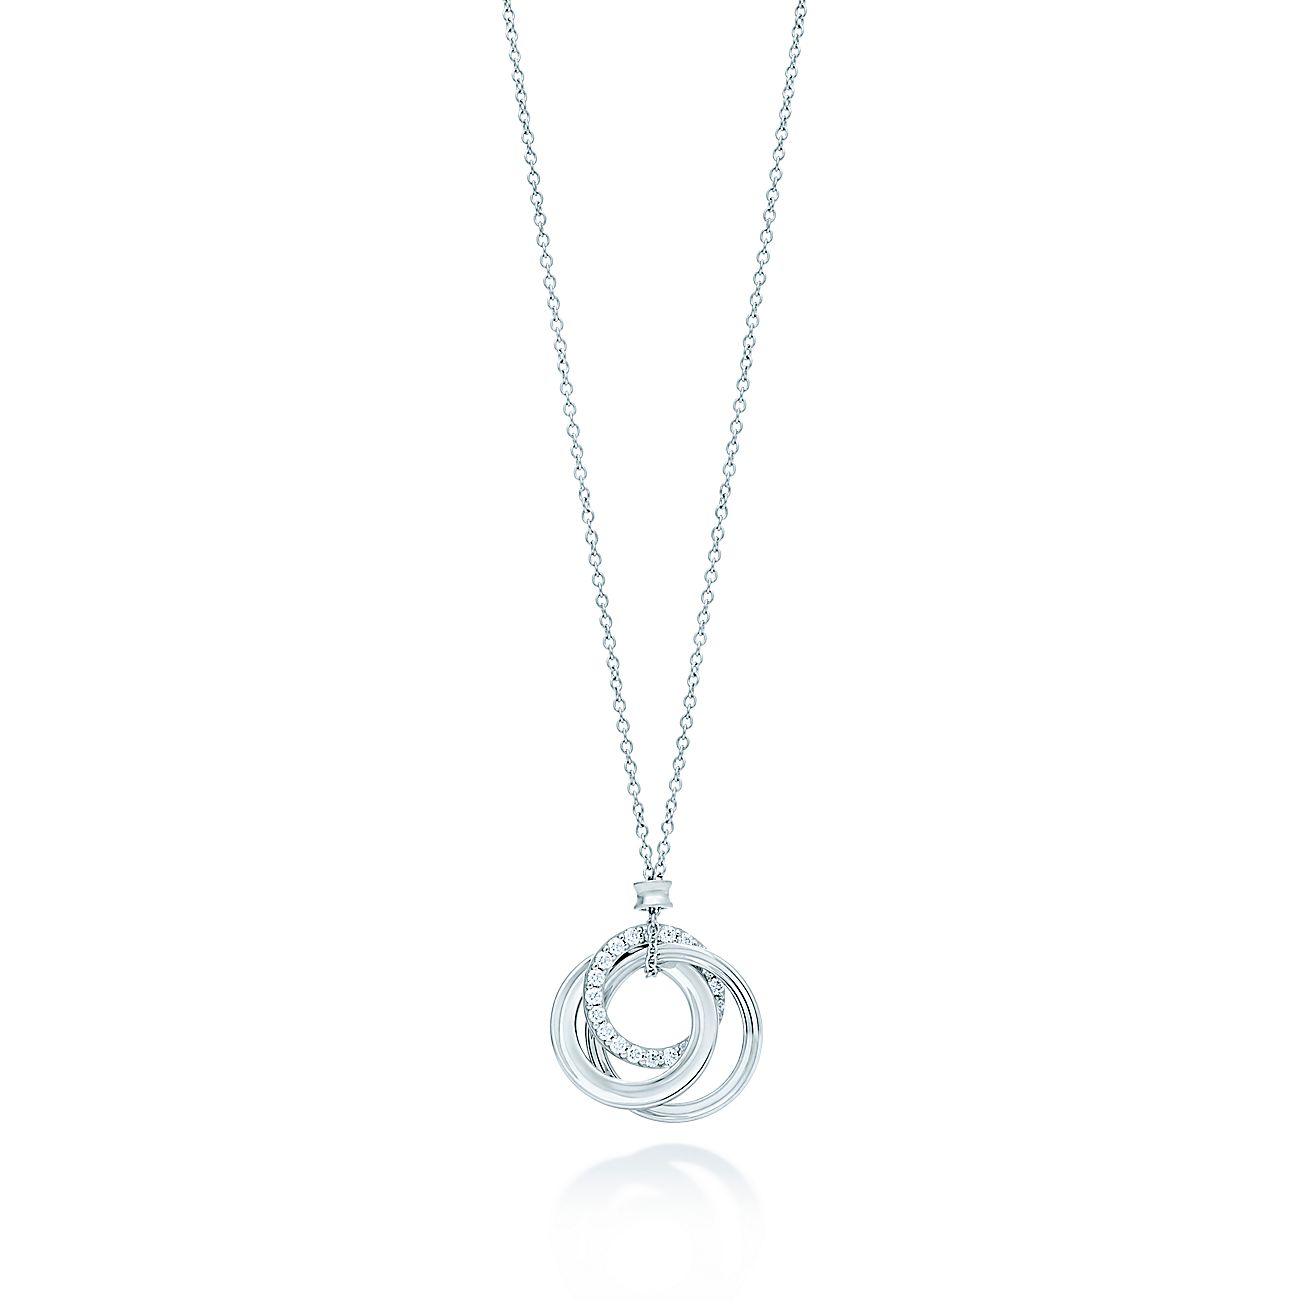 Tiffany 1837 interlocking circles pendant in 18k white gold with tiffany 1837 interlocking circles pendant in 18k white gold with diamonds tiffany co aloadofball Gallery